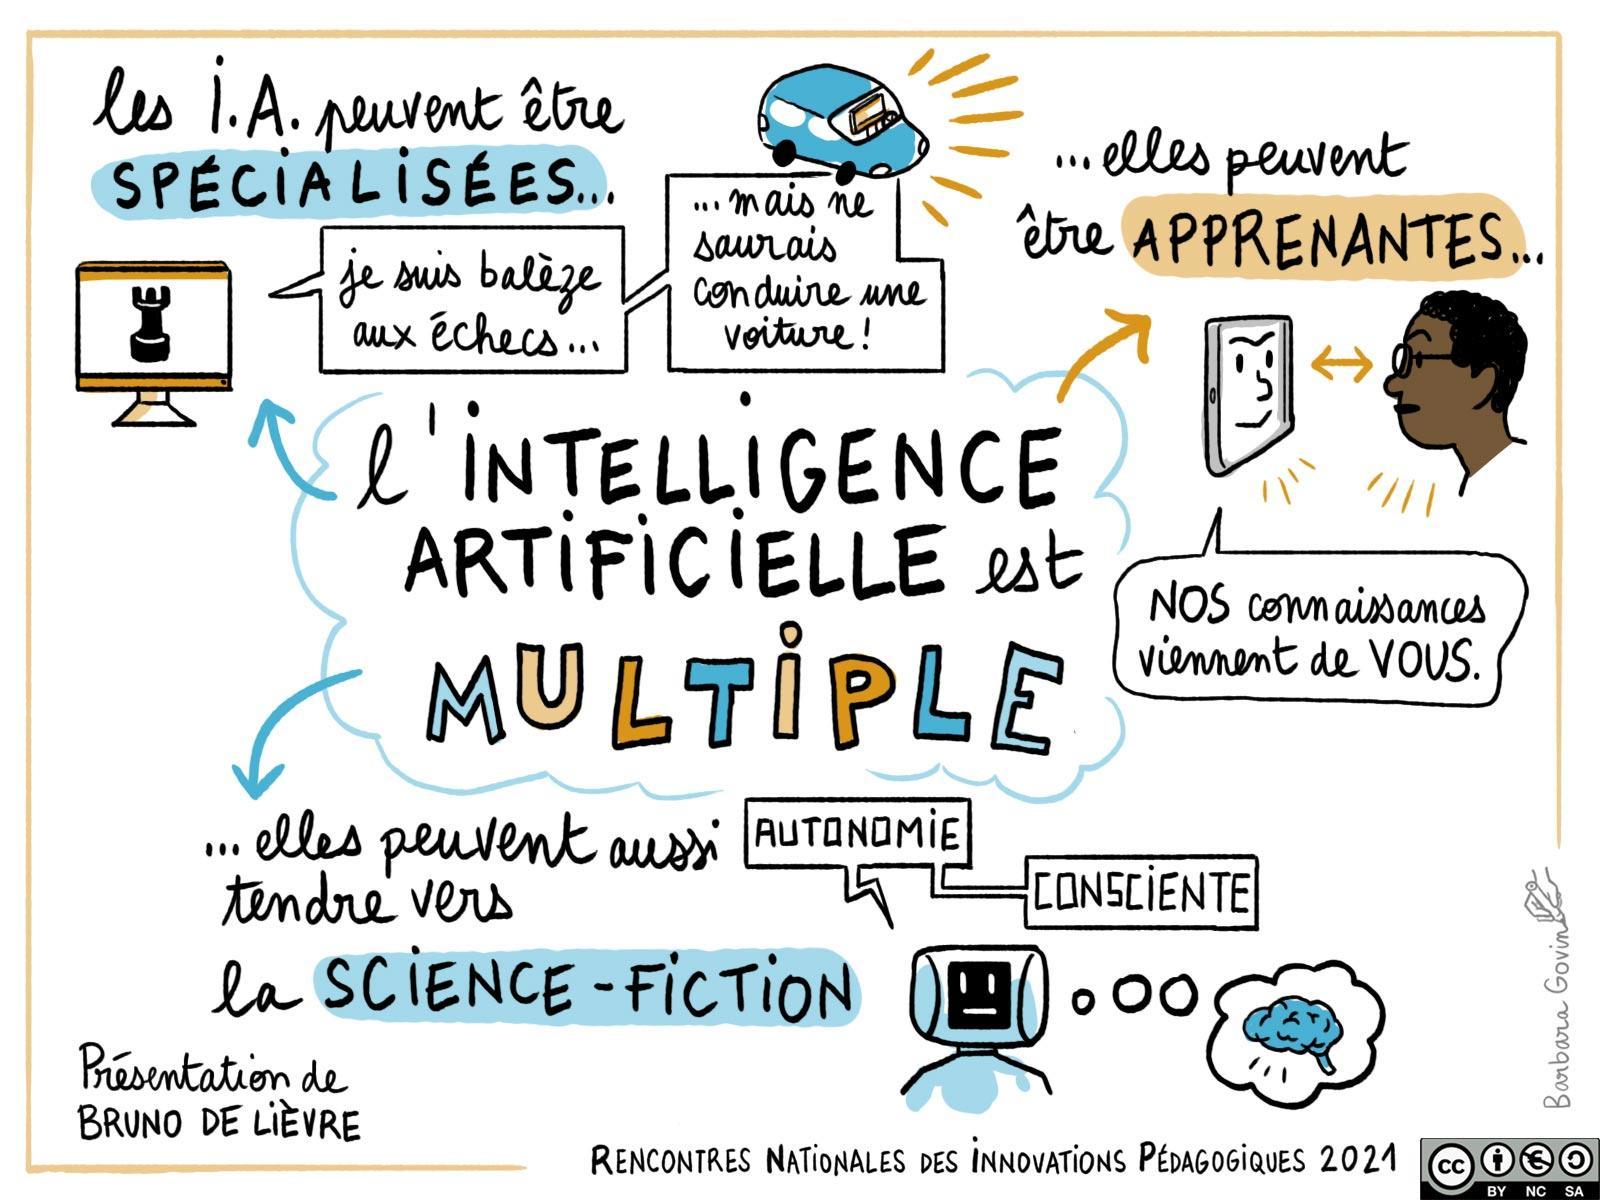 07. Bruno De Lievre - intelligence artificielle multiple